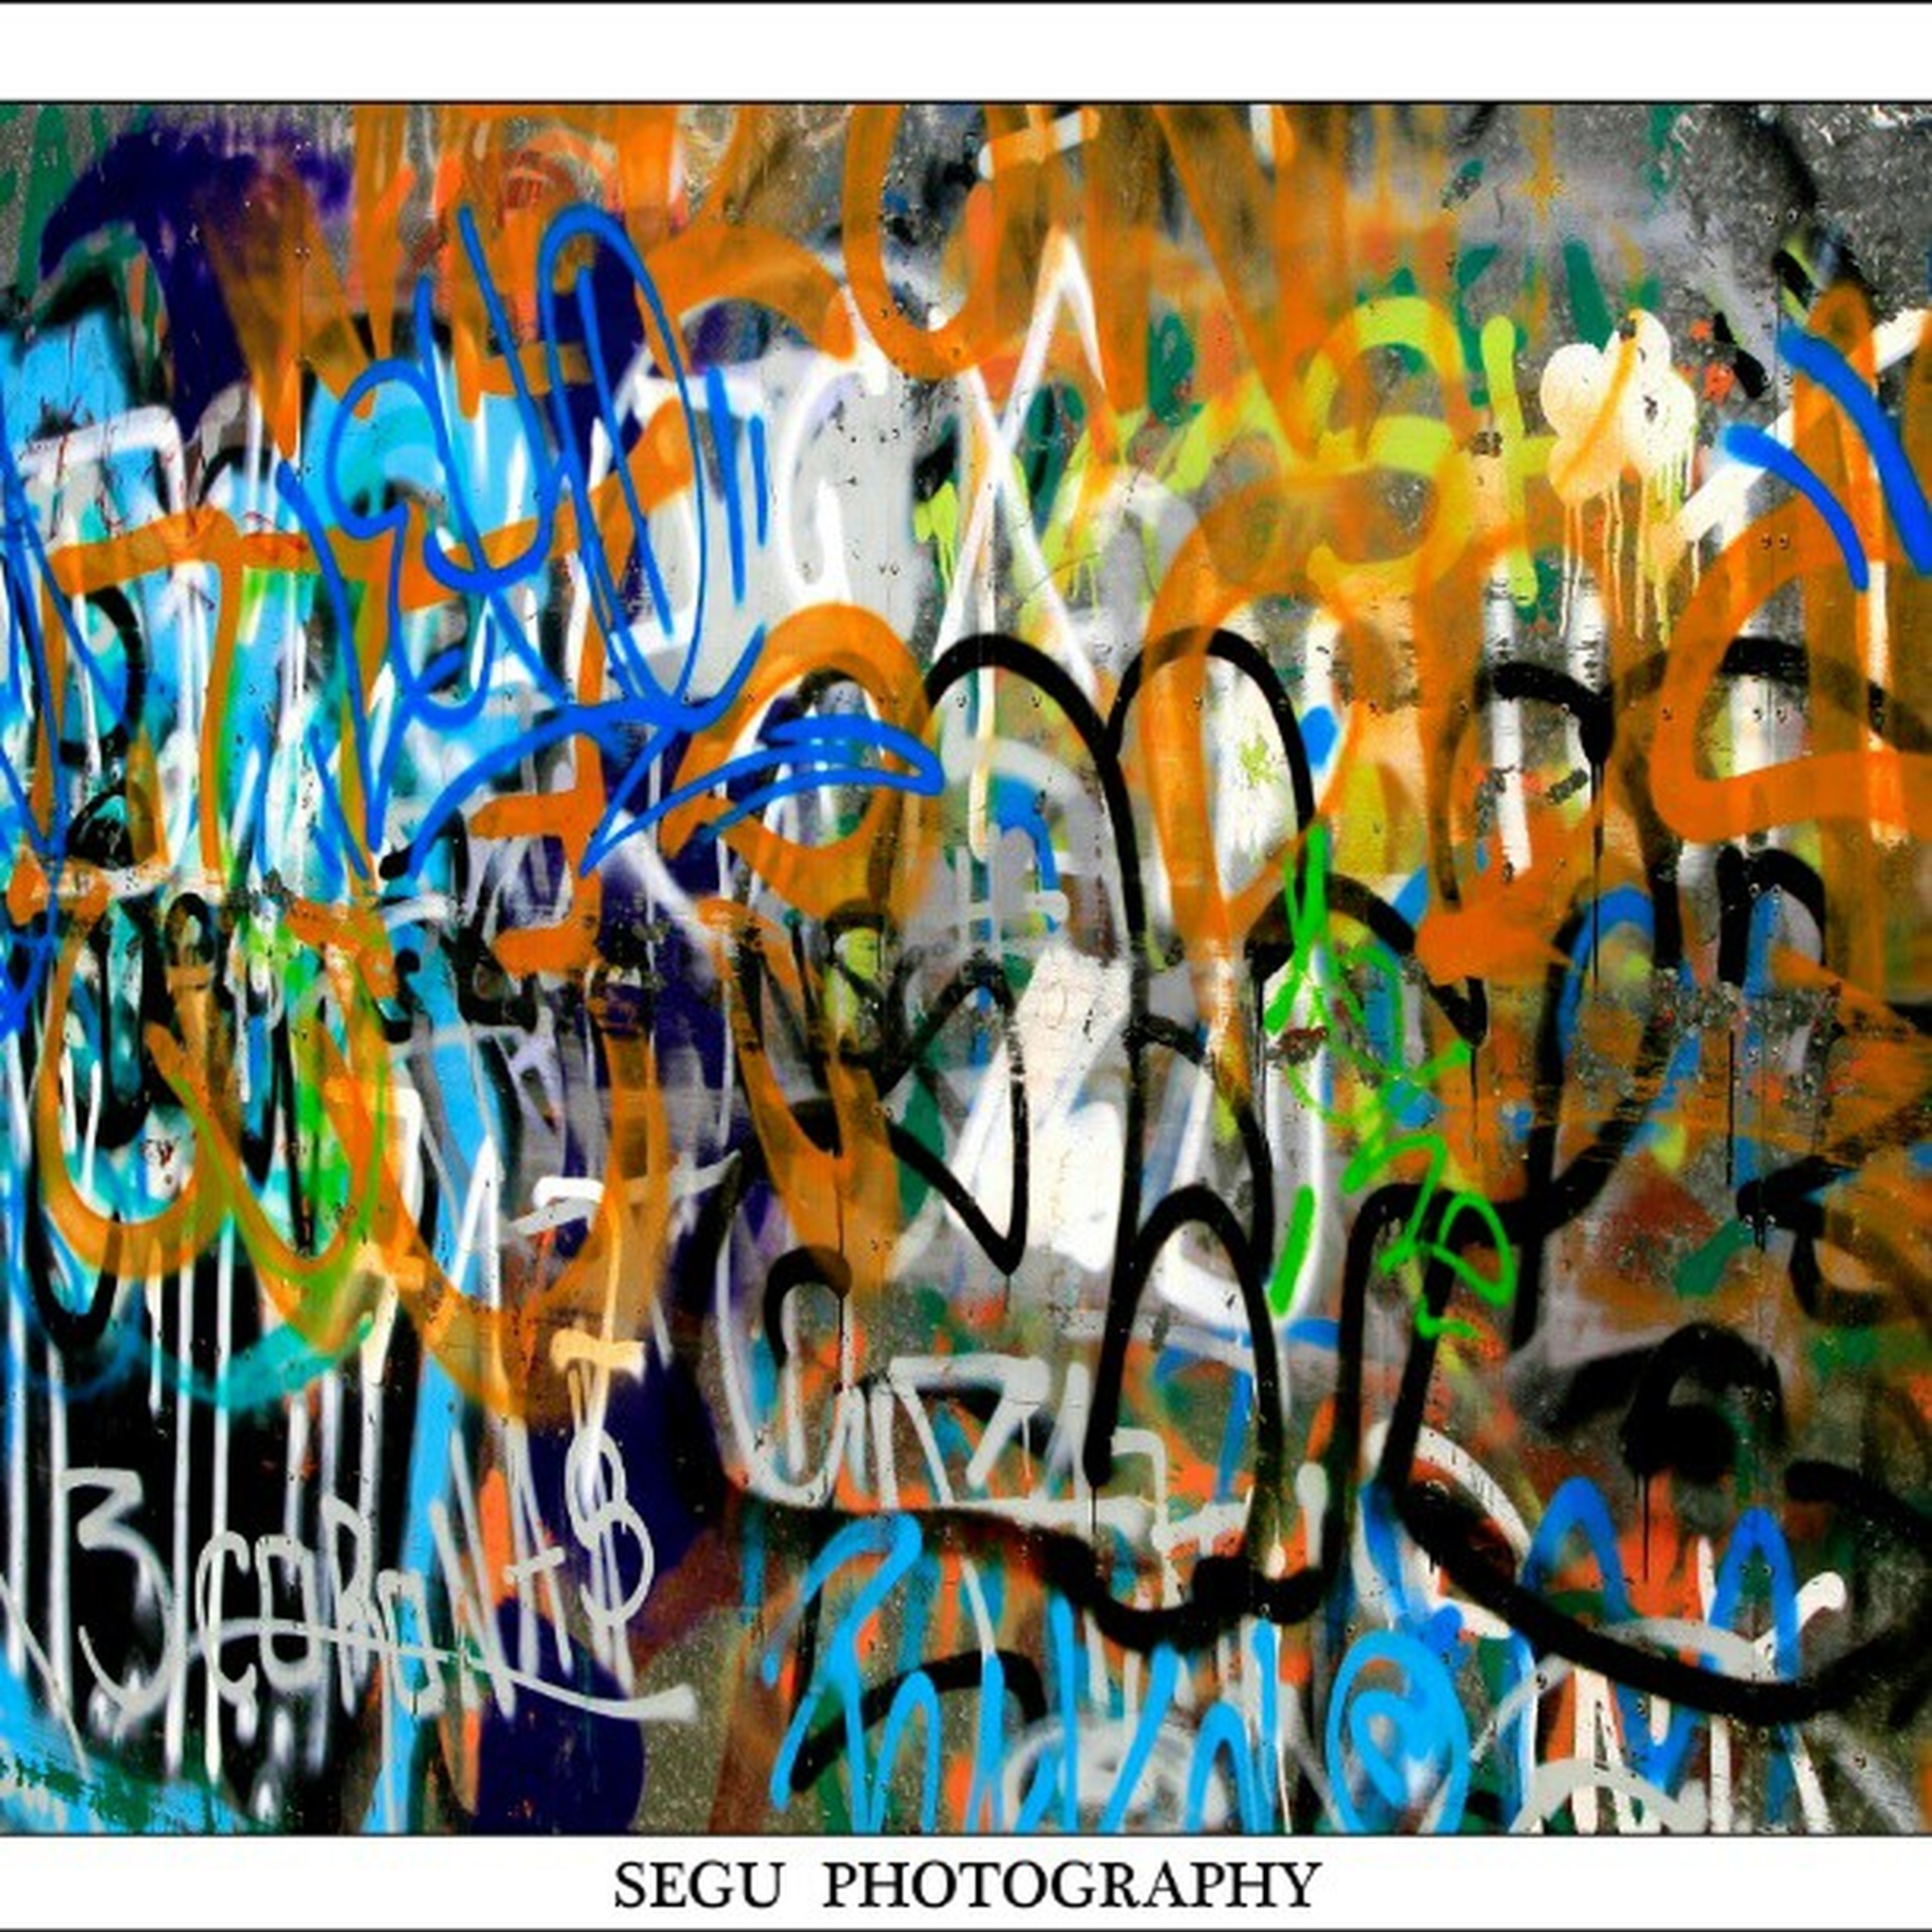 art, creativity, art and craft, graffiti, multi colored, text, human representation, street art, western script, wall - building feature, painting, mural, communication, animal representation, craft, colorful, design, blue